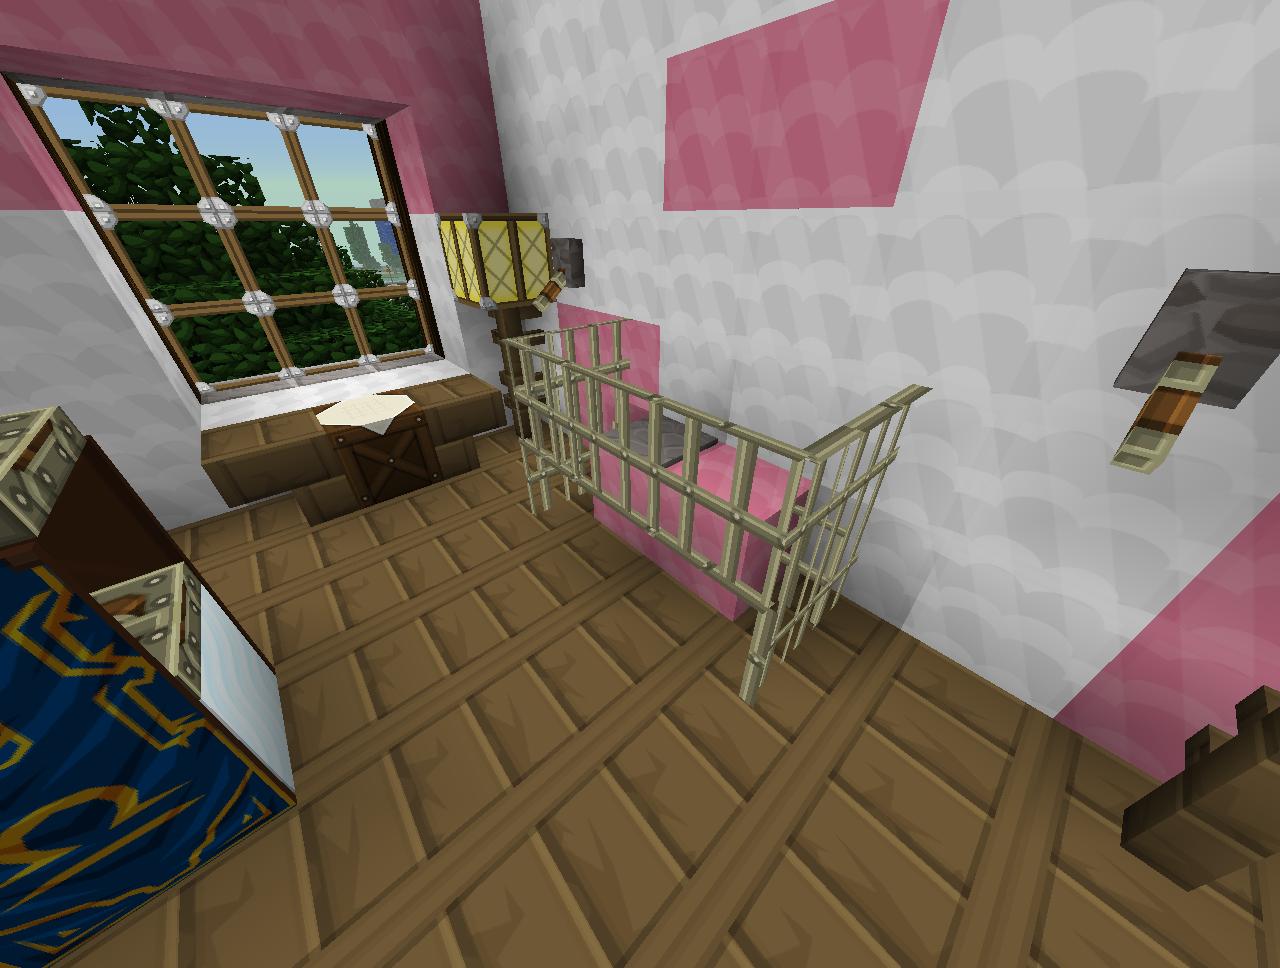 minecraft modern house bedroom - Google Search | Minecraft ...